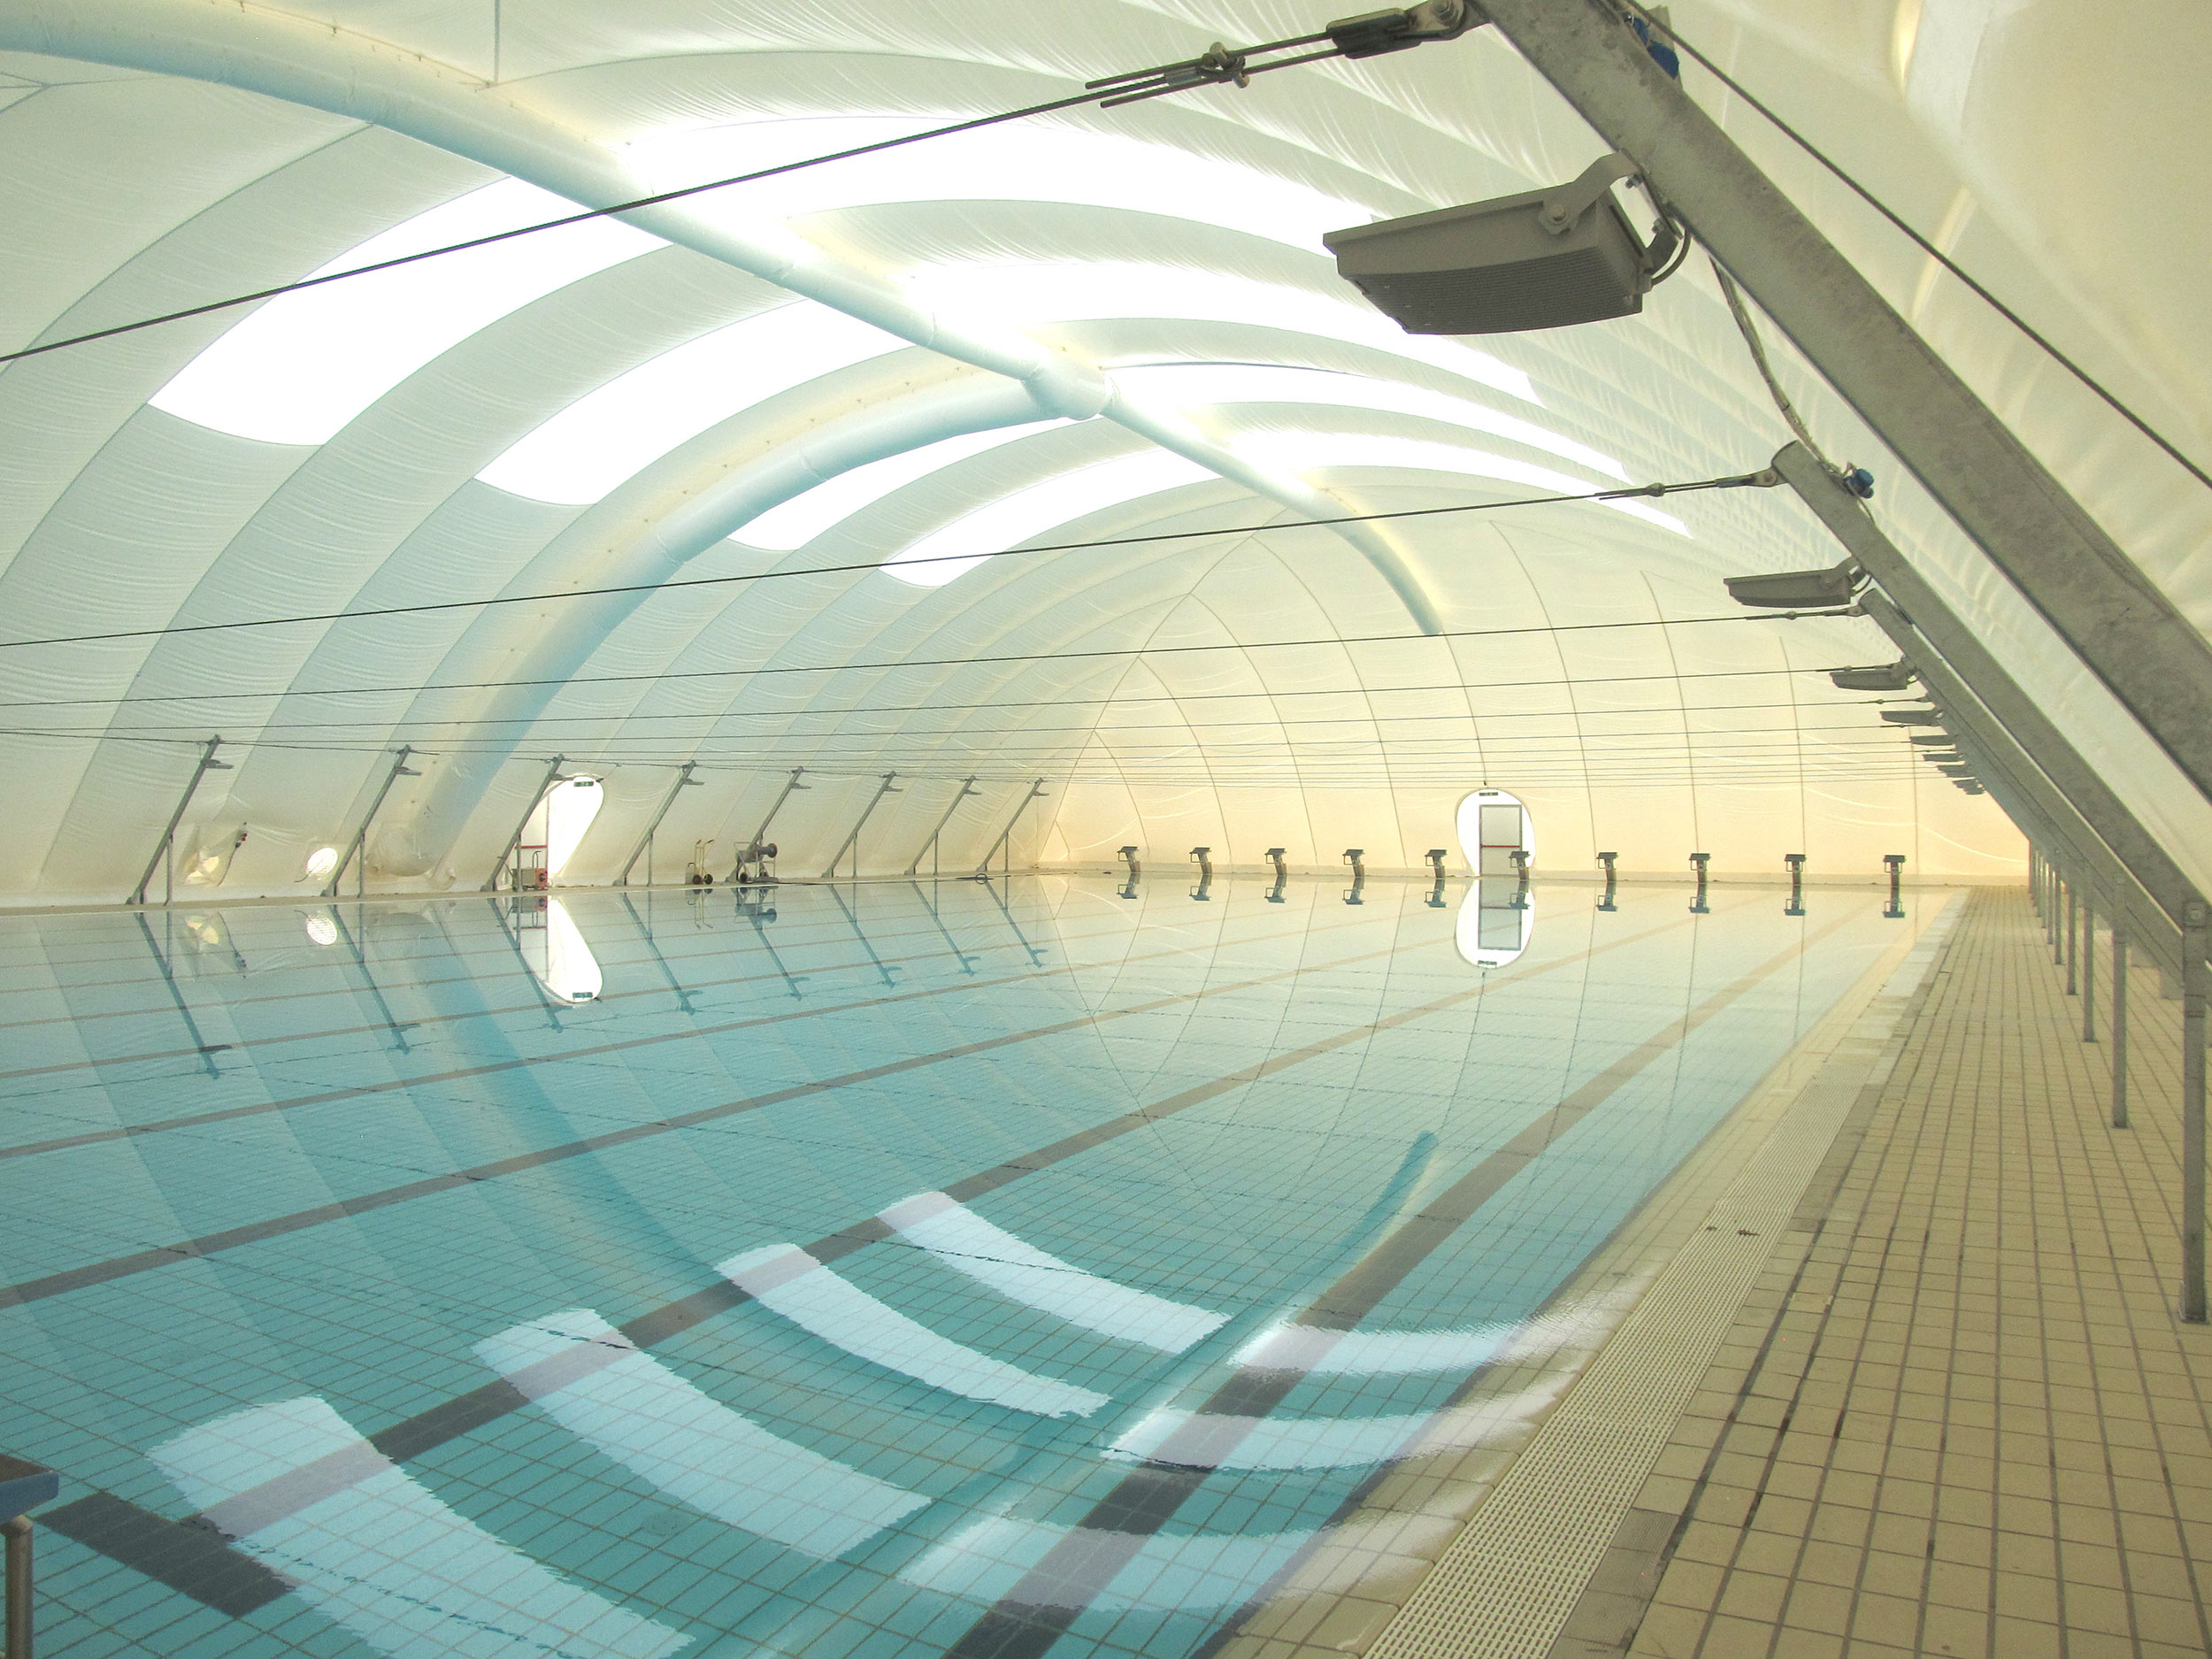 copertura in poliestere pvc per piscina